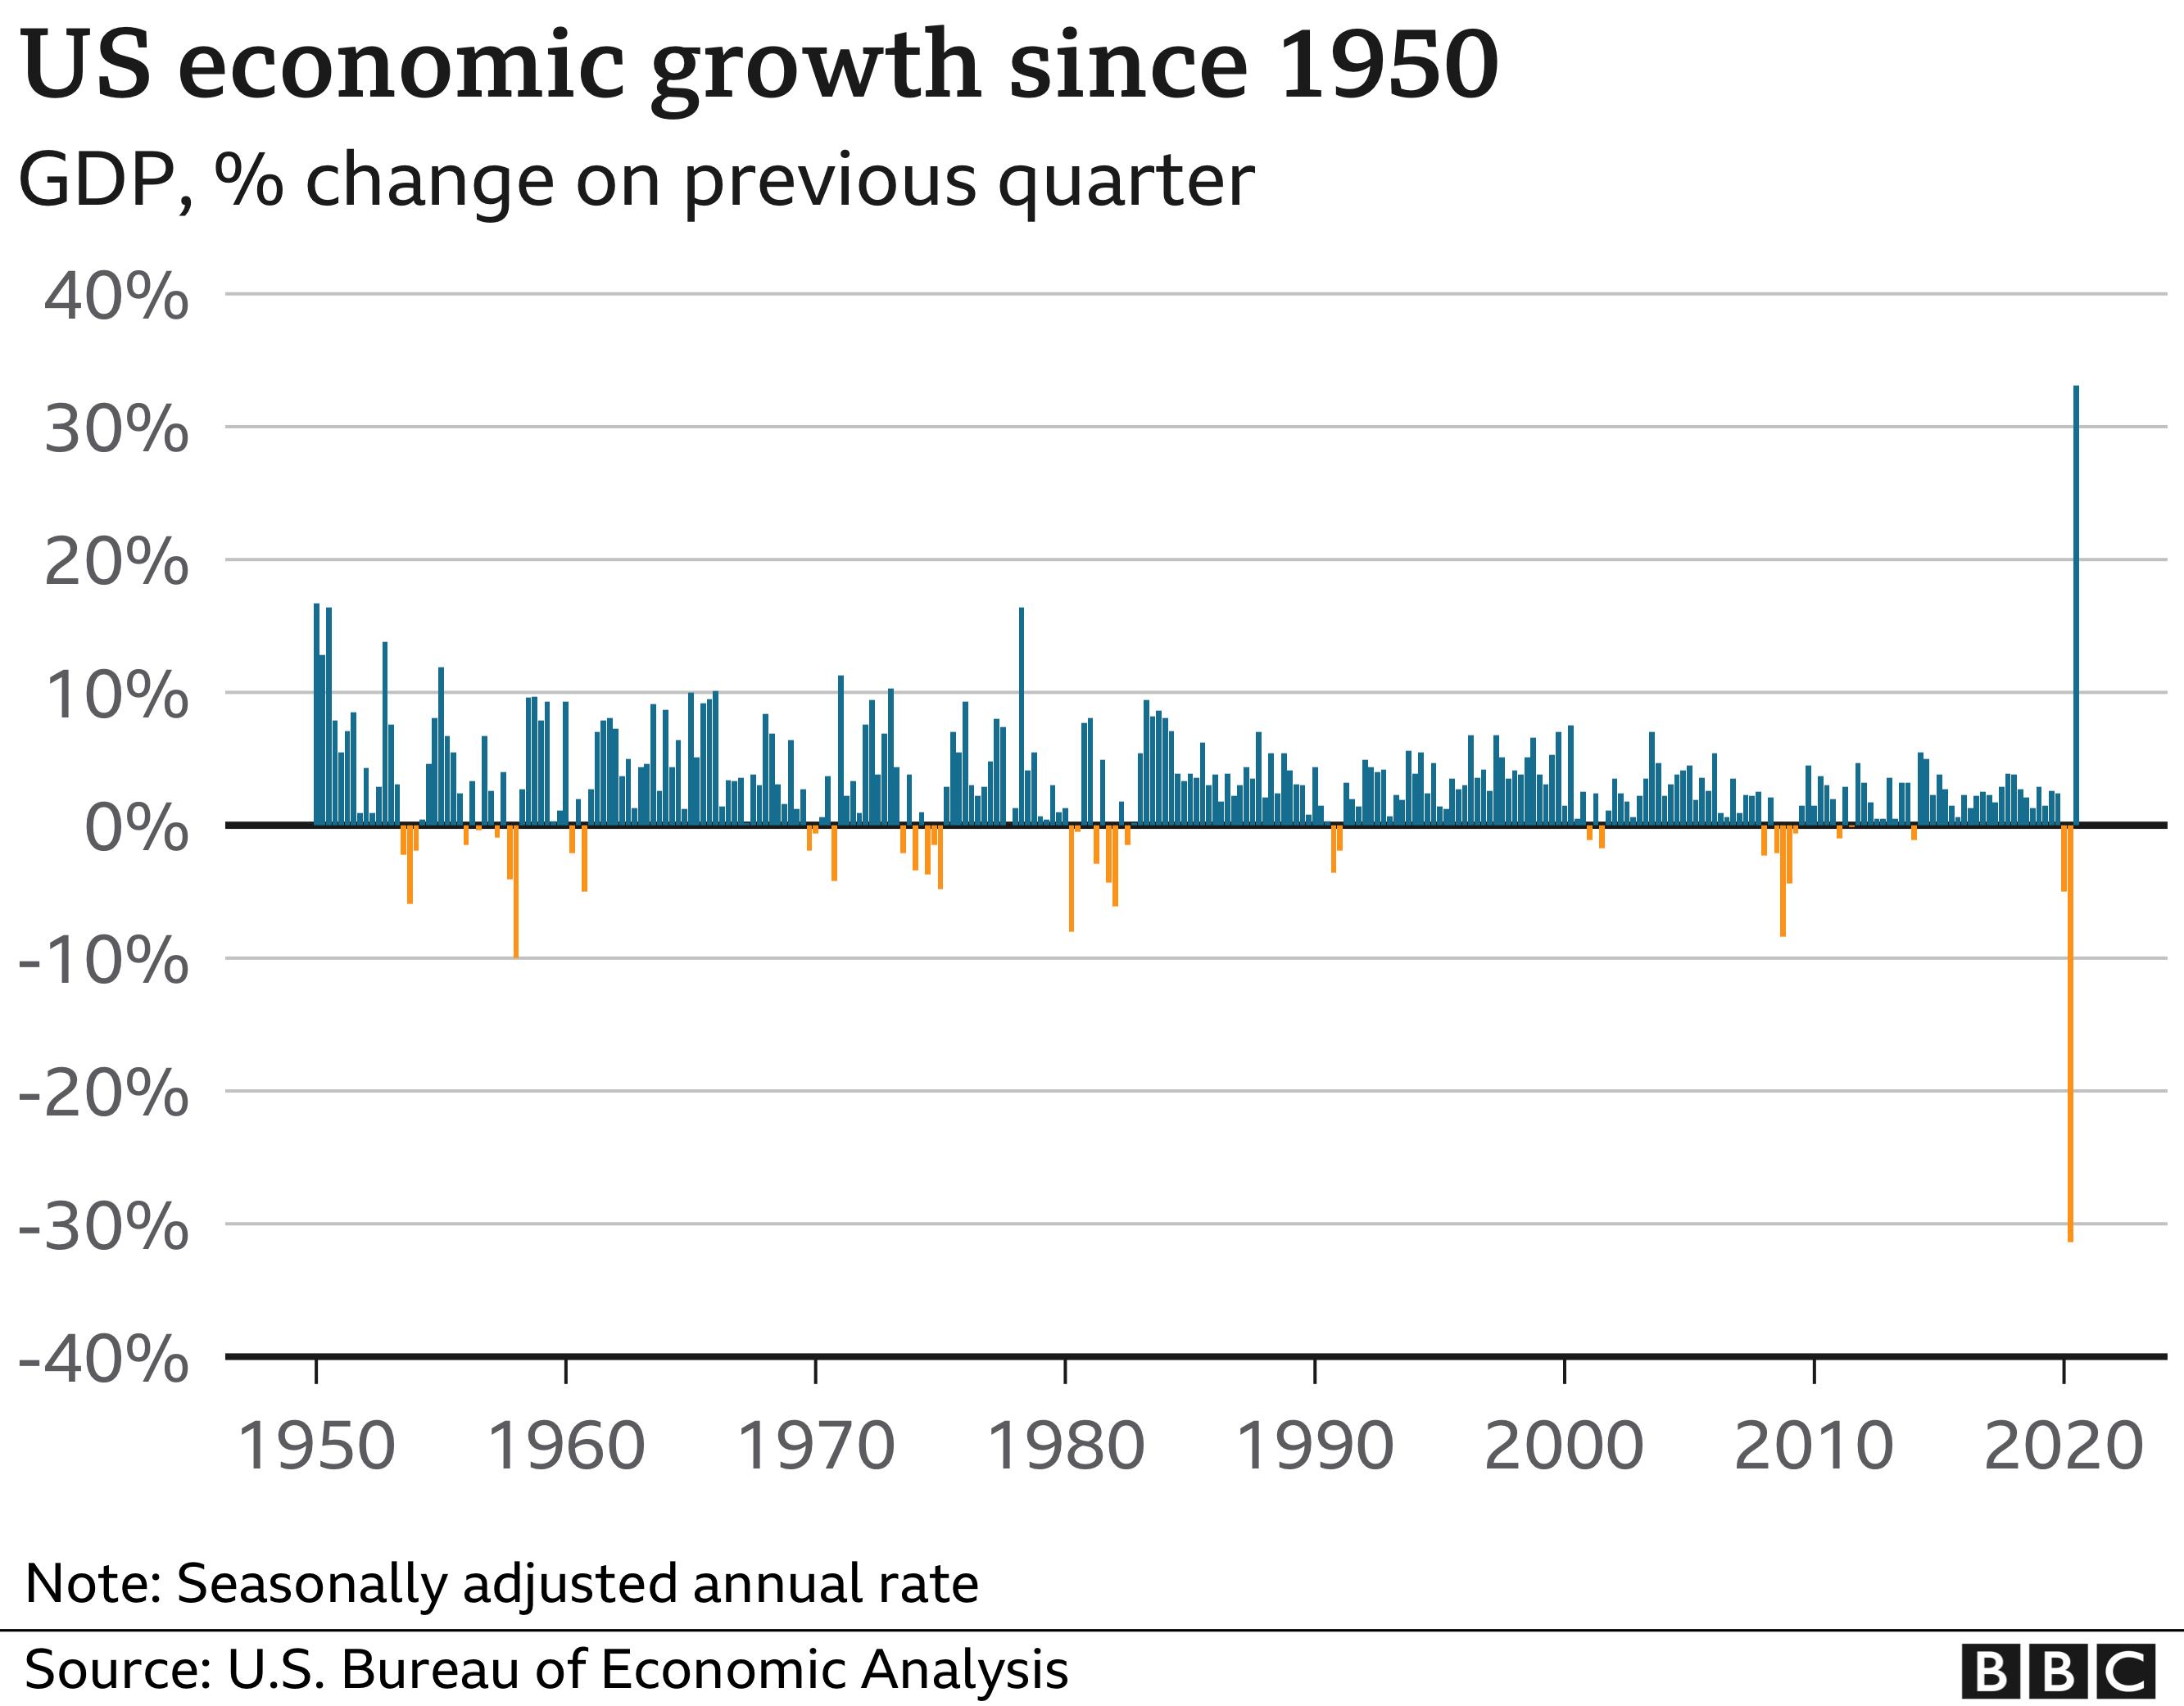 US economic growth since 1950 chart